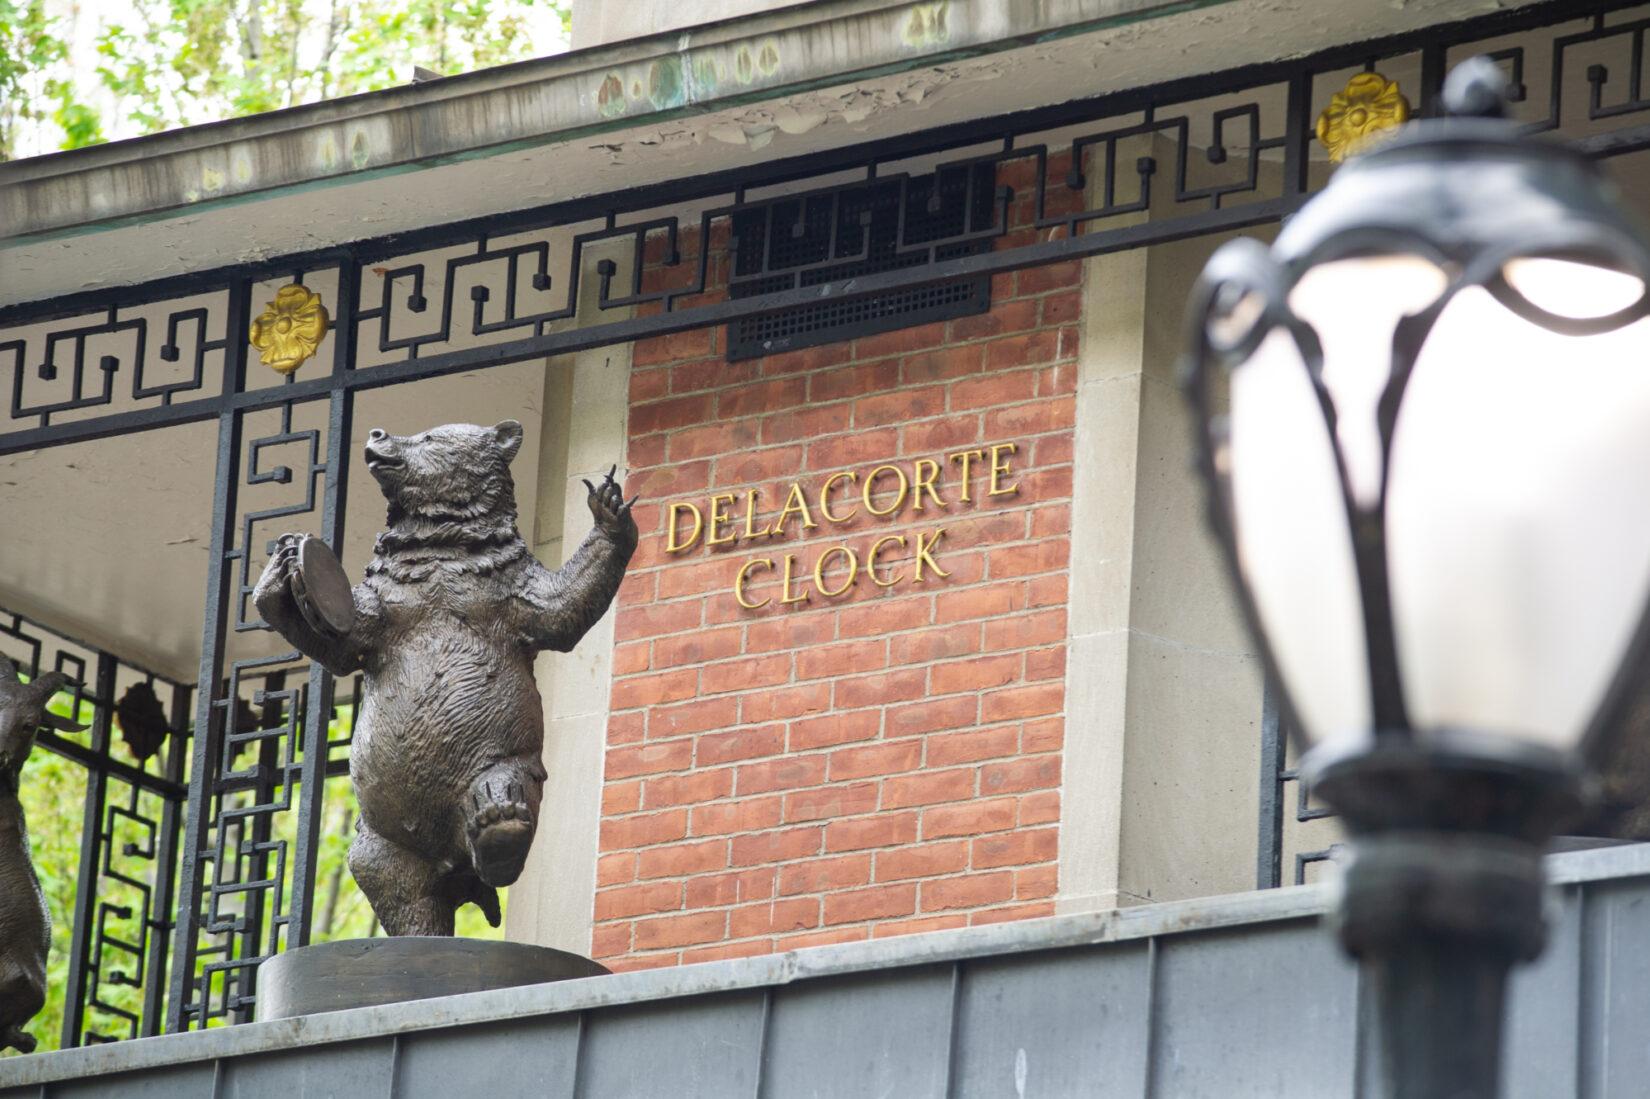 A playful statue of a bear dances around the Delacorte Clock